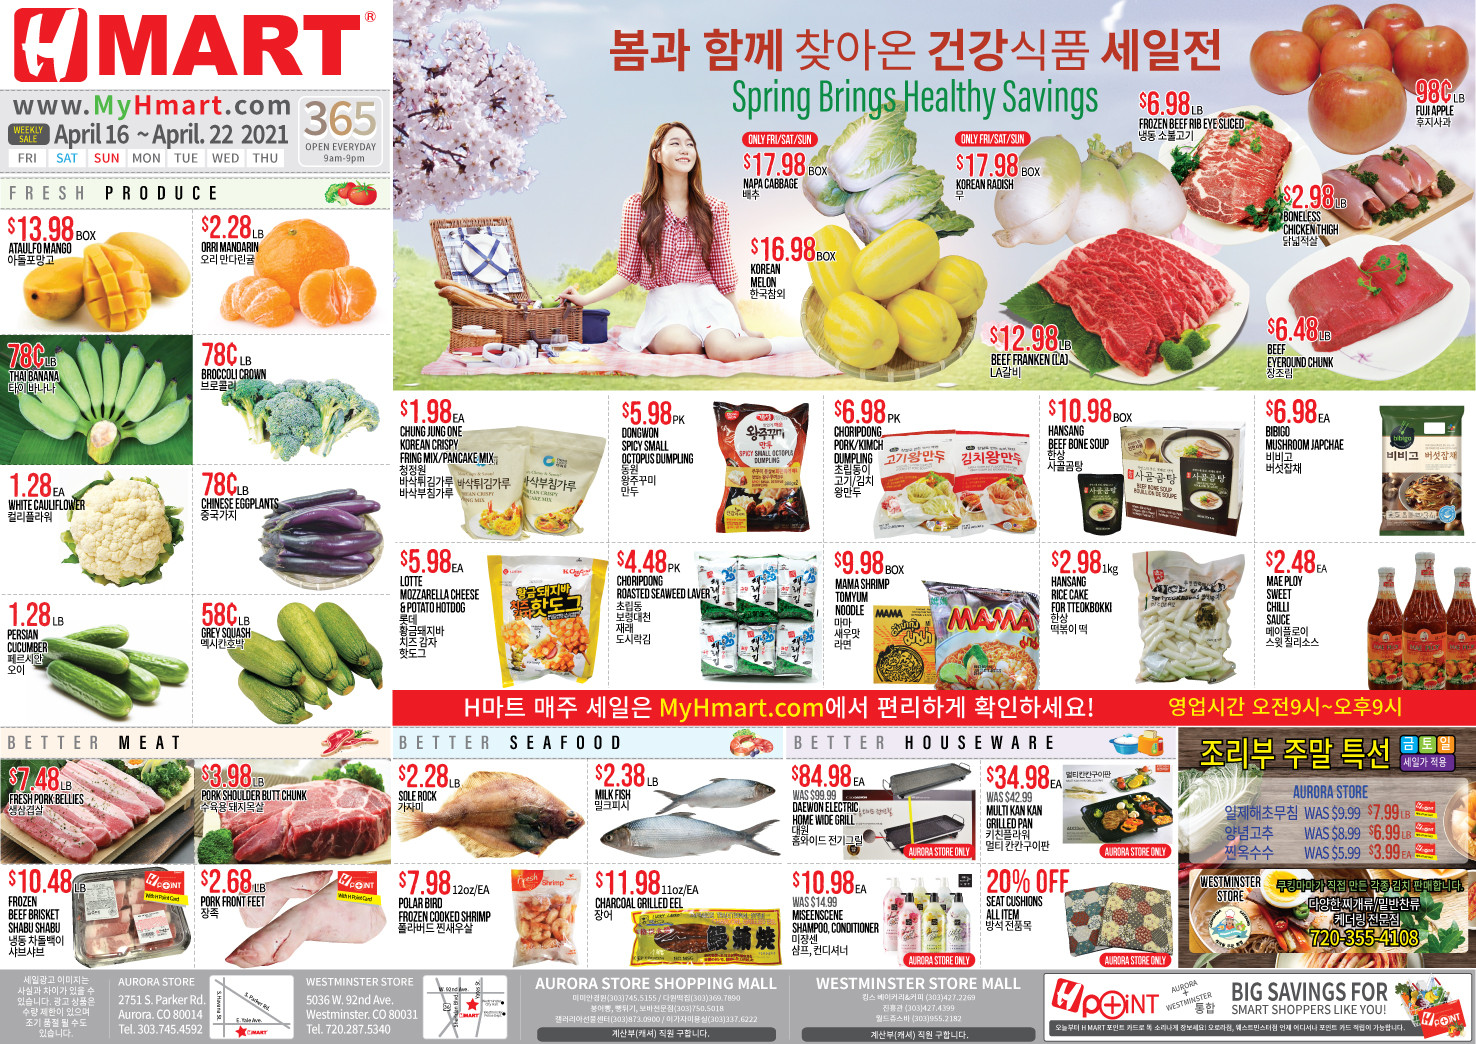 041621_koreanad.jpg